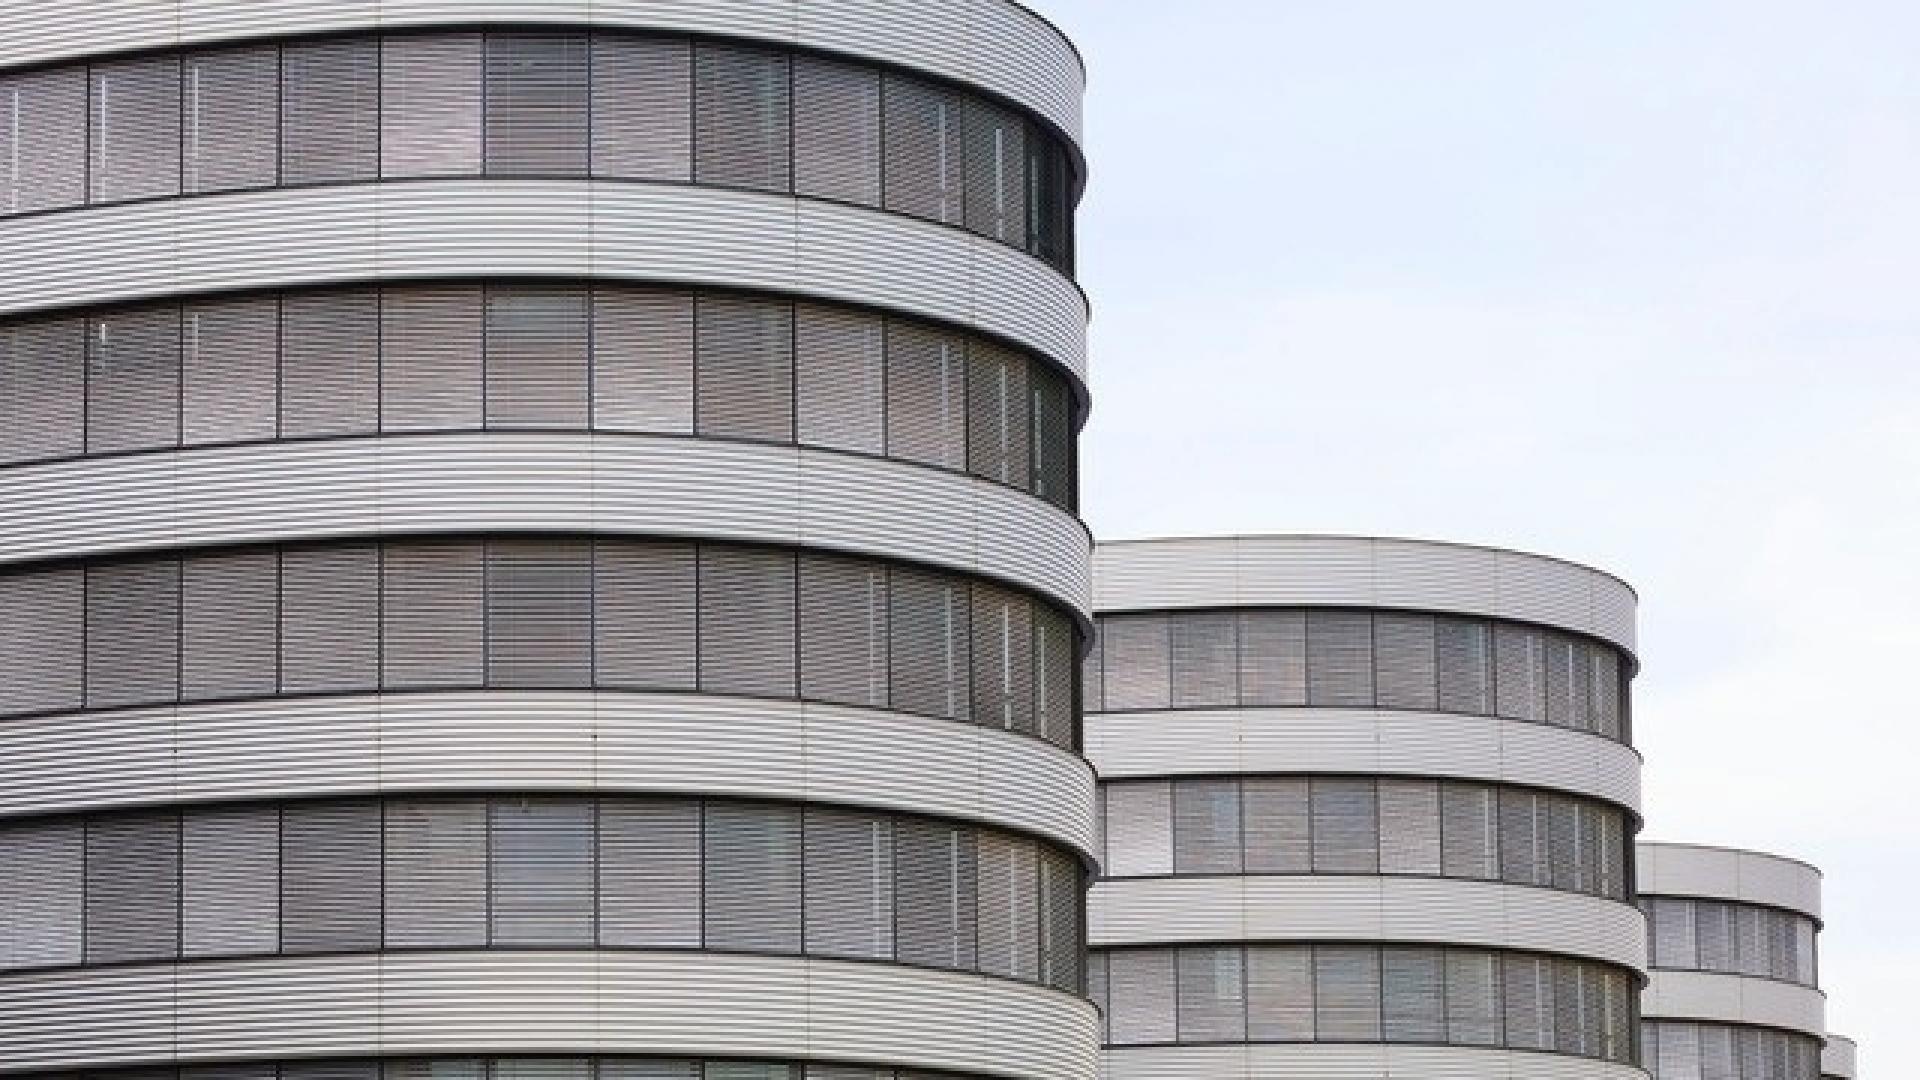 Fotowalk Duisburger Hafen - Canon Academy